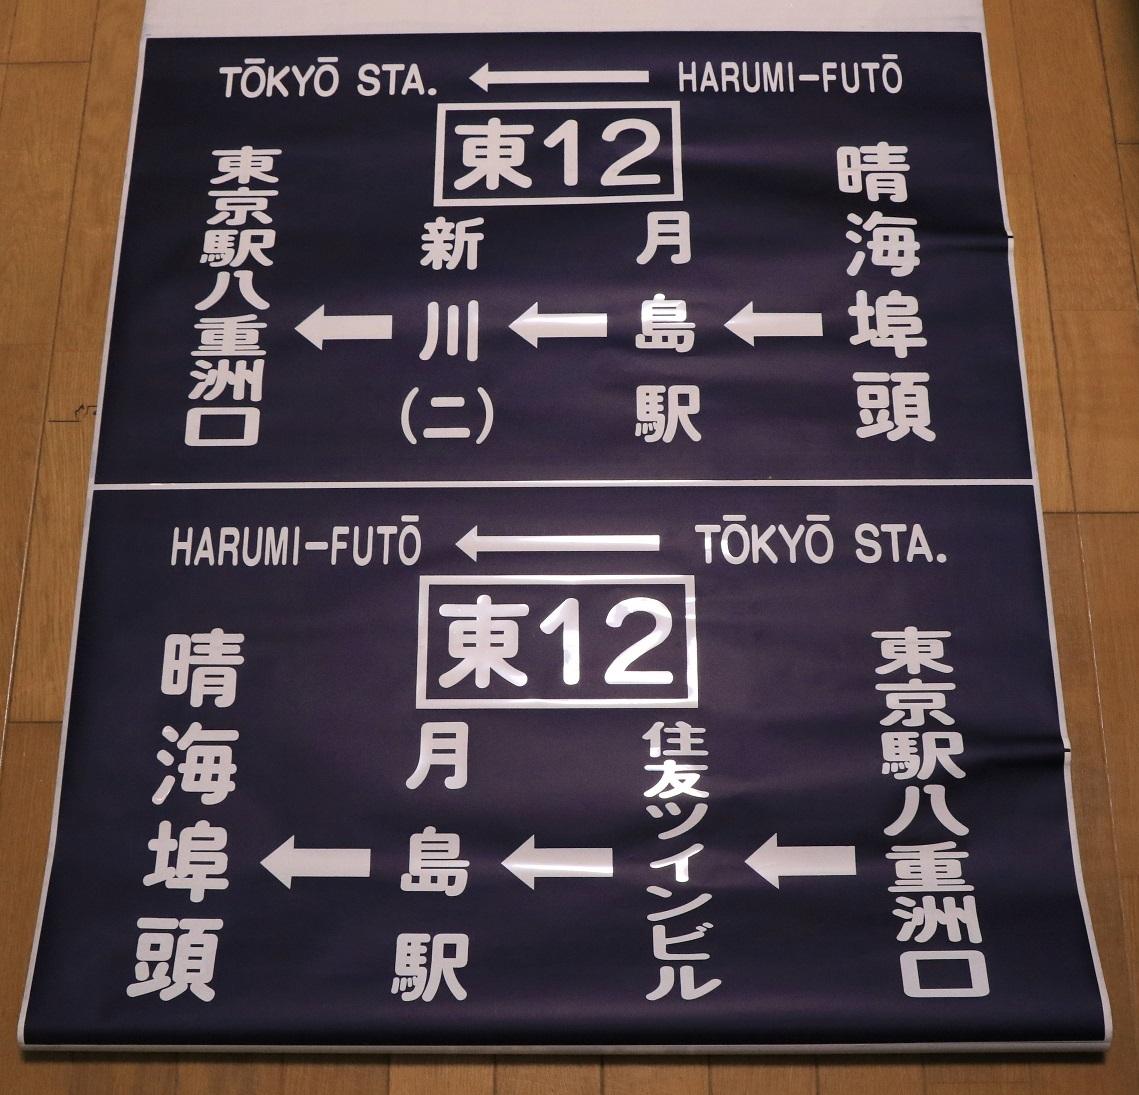 【都営バス】深川営業所・側面方向幕/98コマ収録/H2.4~使用_画像7